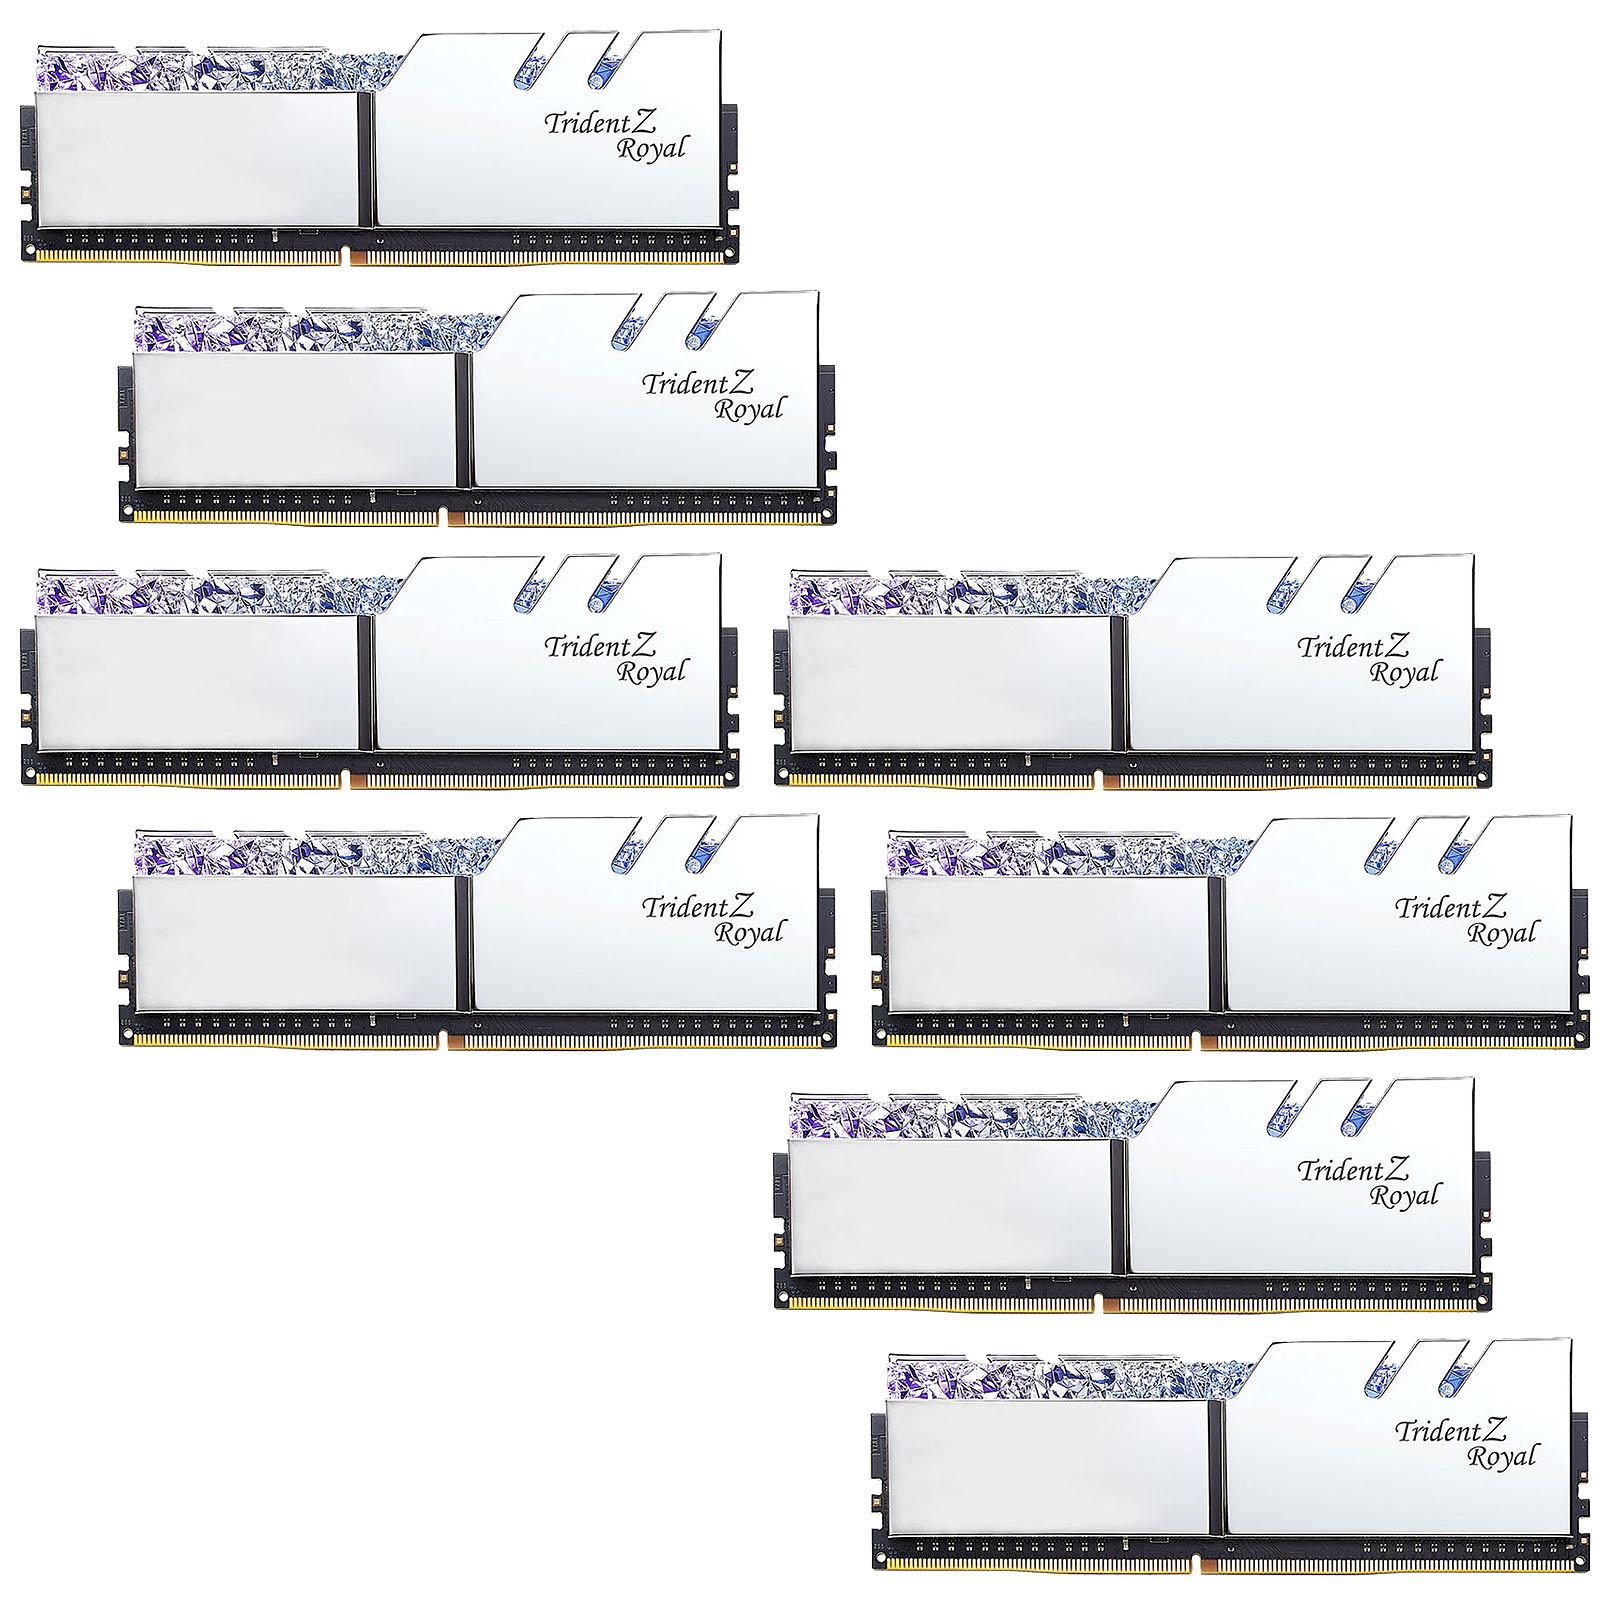 G.Skill Trident Z Royal 256 GB (8 x 32 GB) DDR4 3600 MHz CL16 - Plata